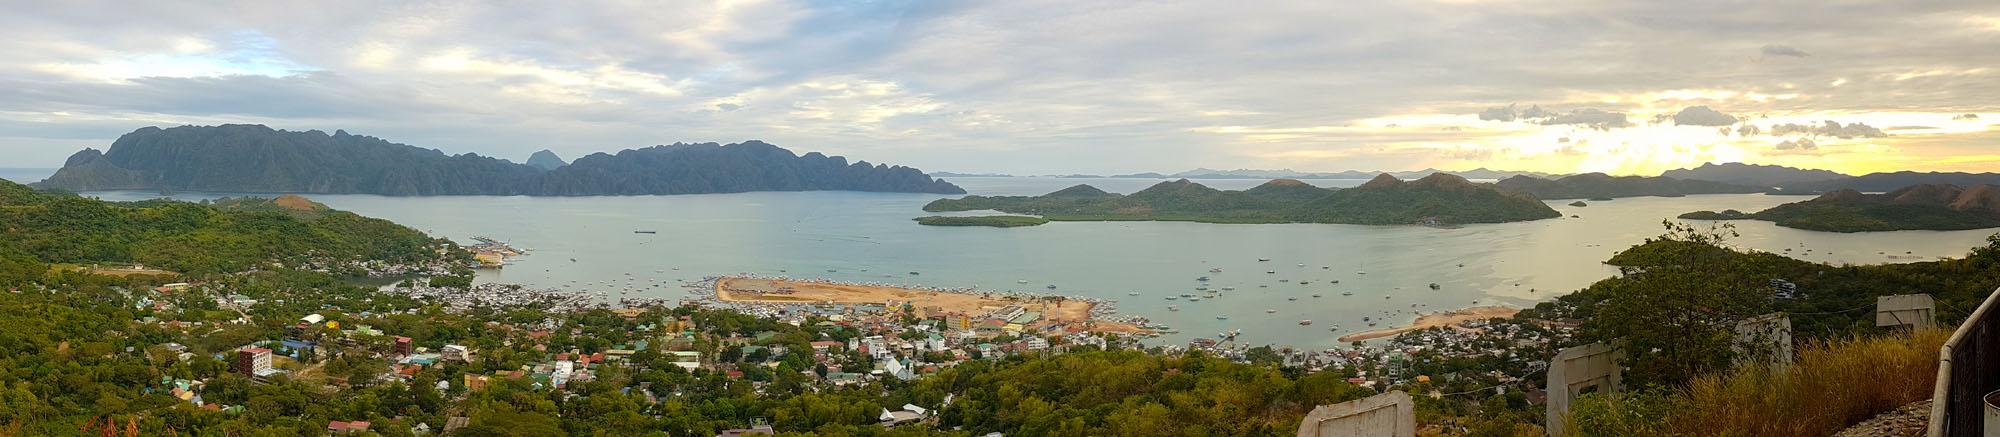 Philippines Coron Mont Tapyas vue panoramique